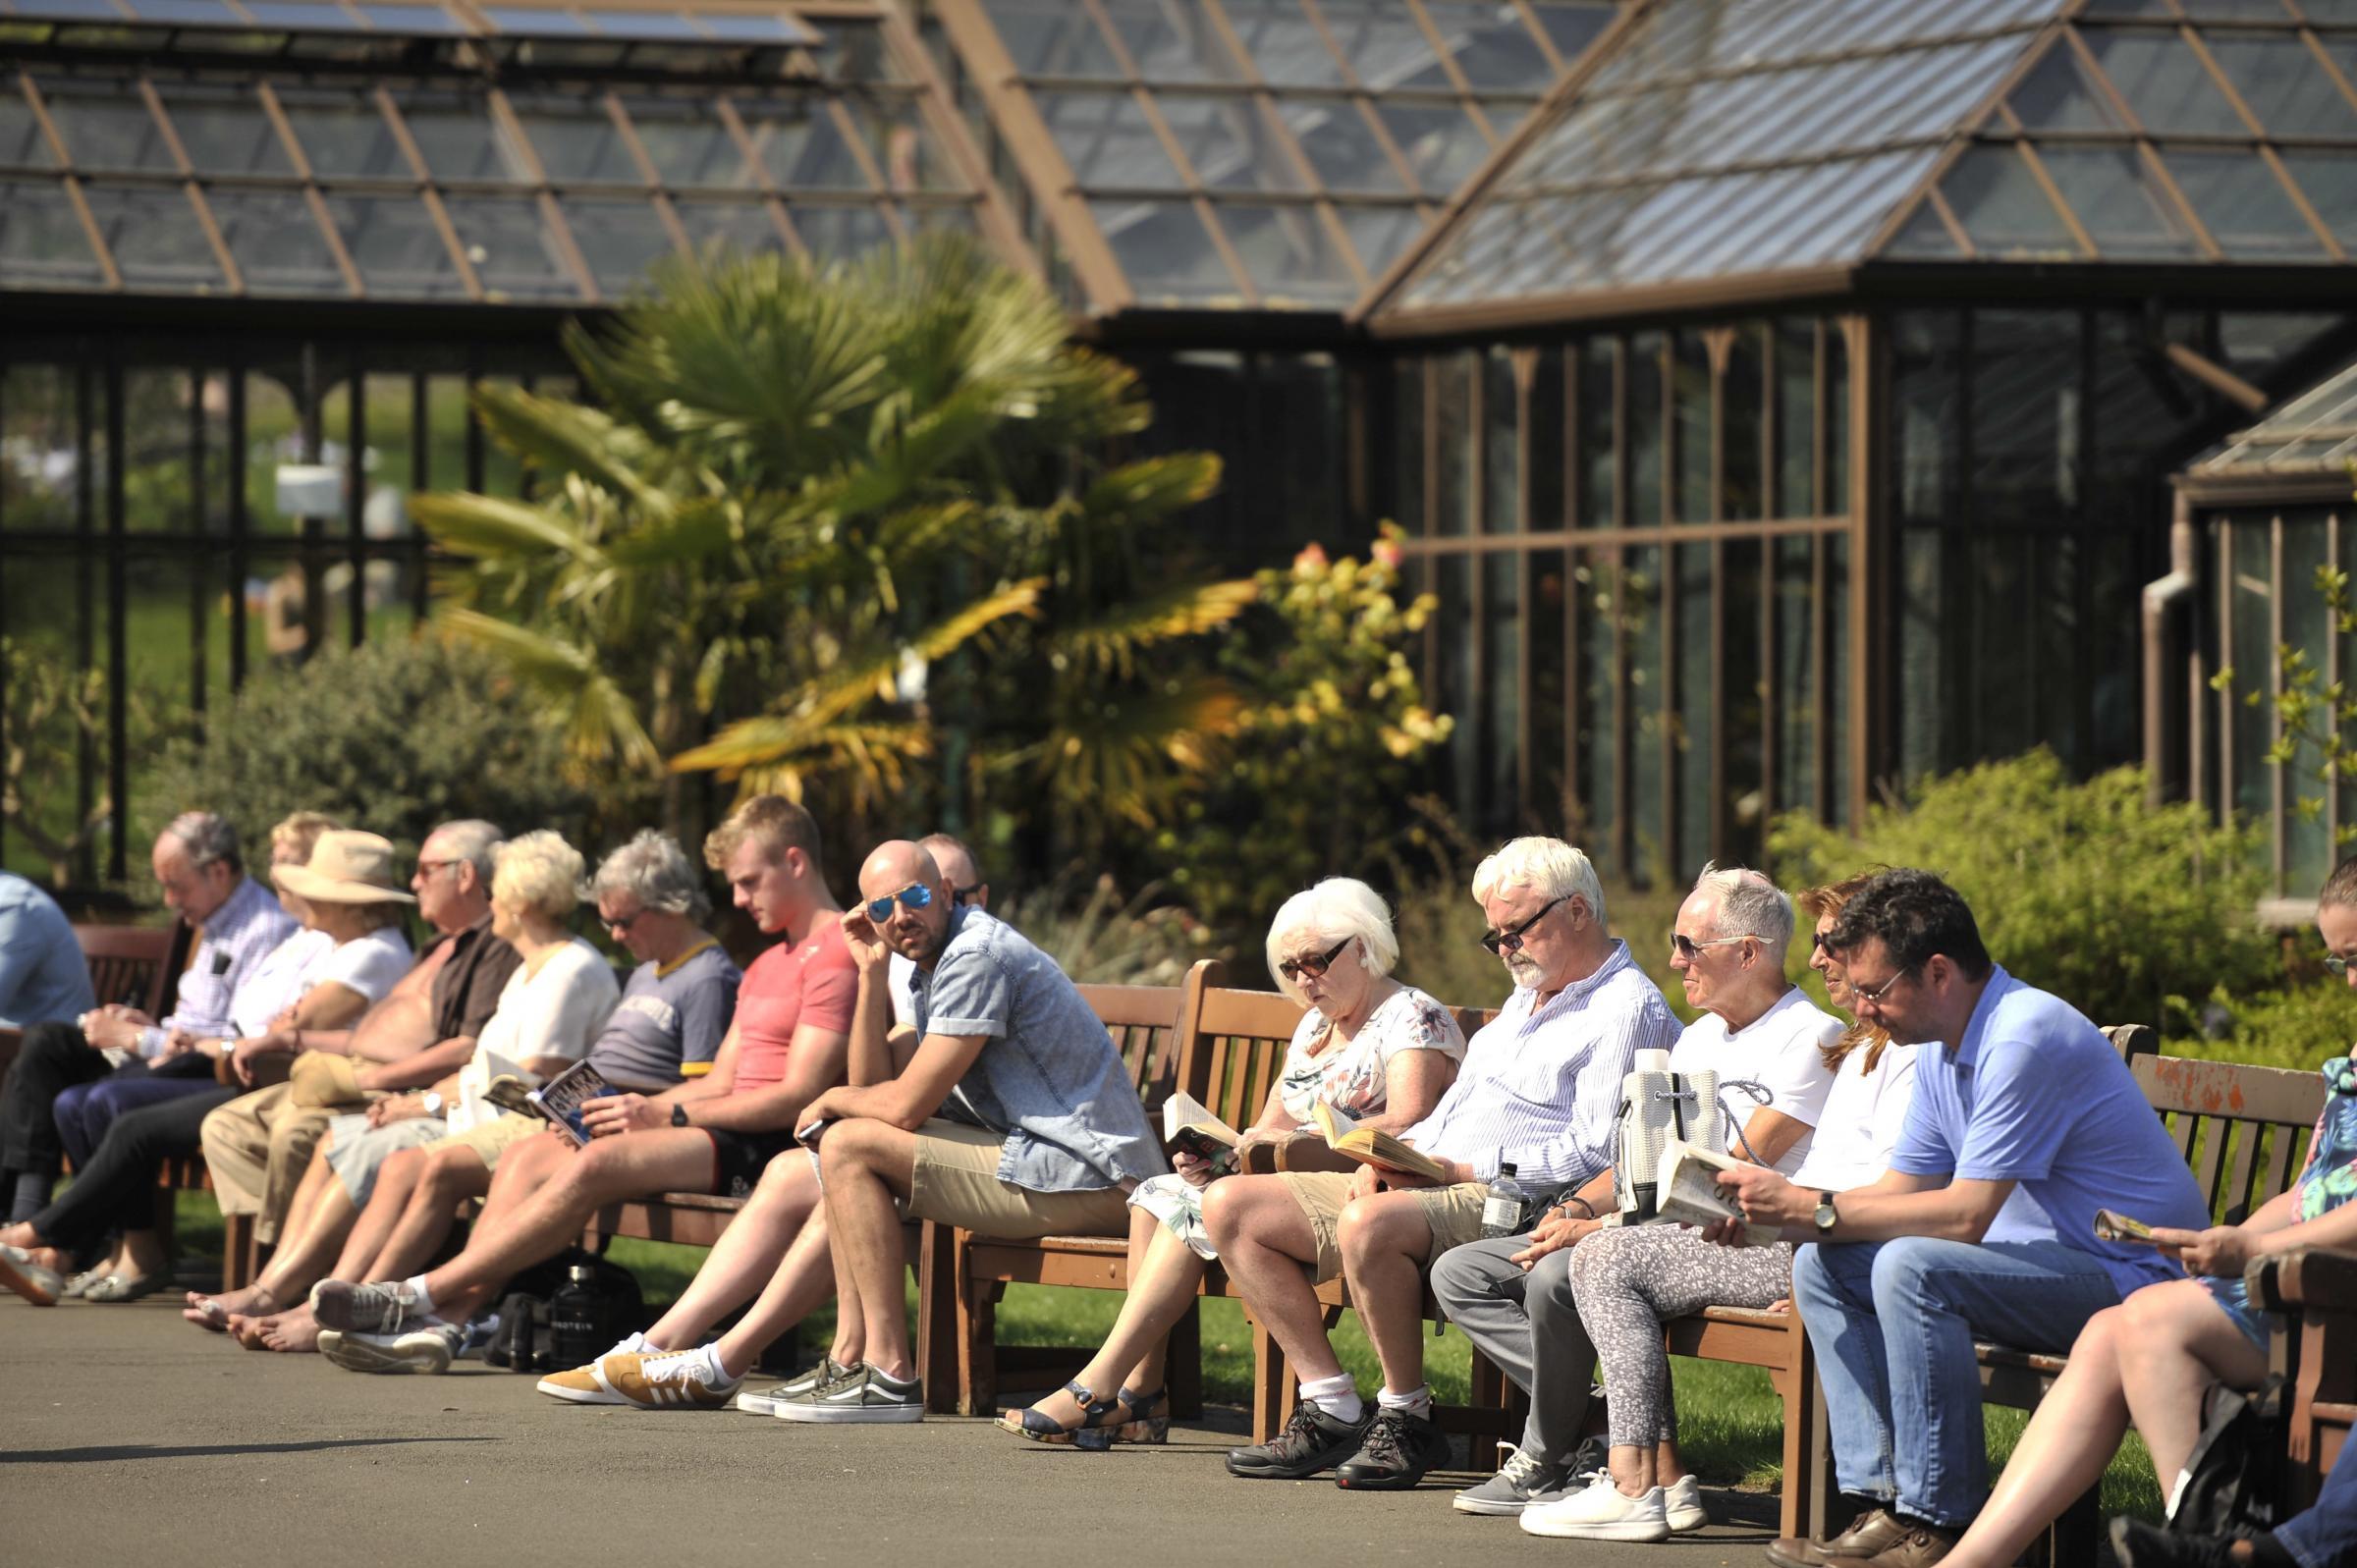 Glasgow Botanic Gardens full as revellers soak up last of bank holiday sun